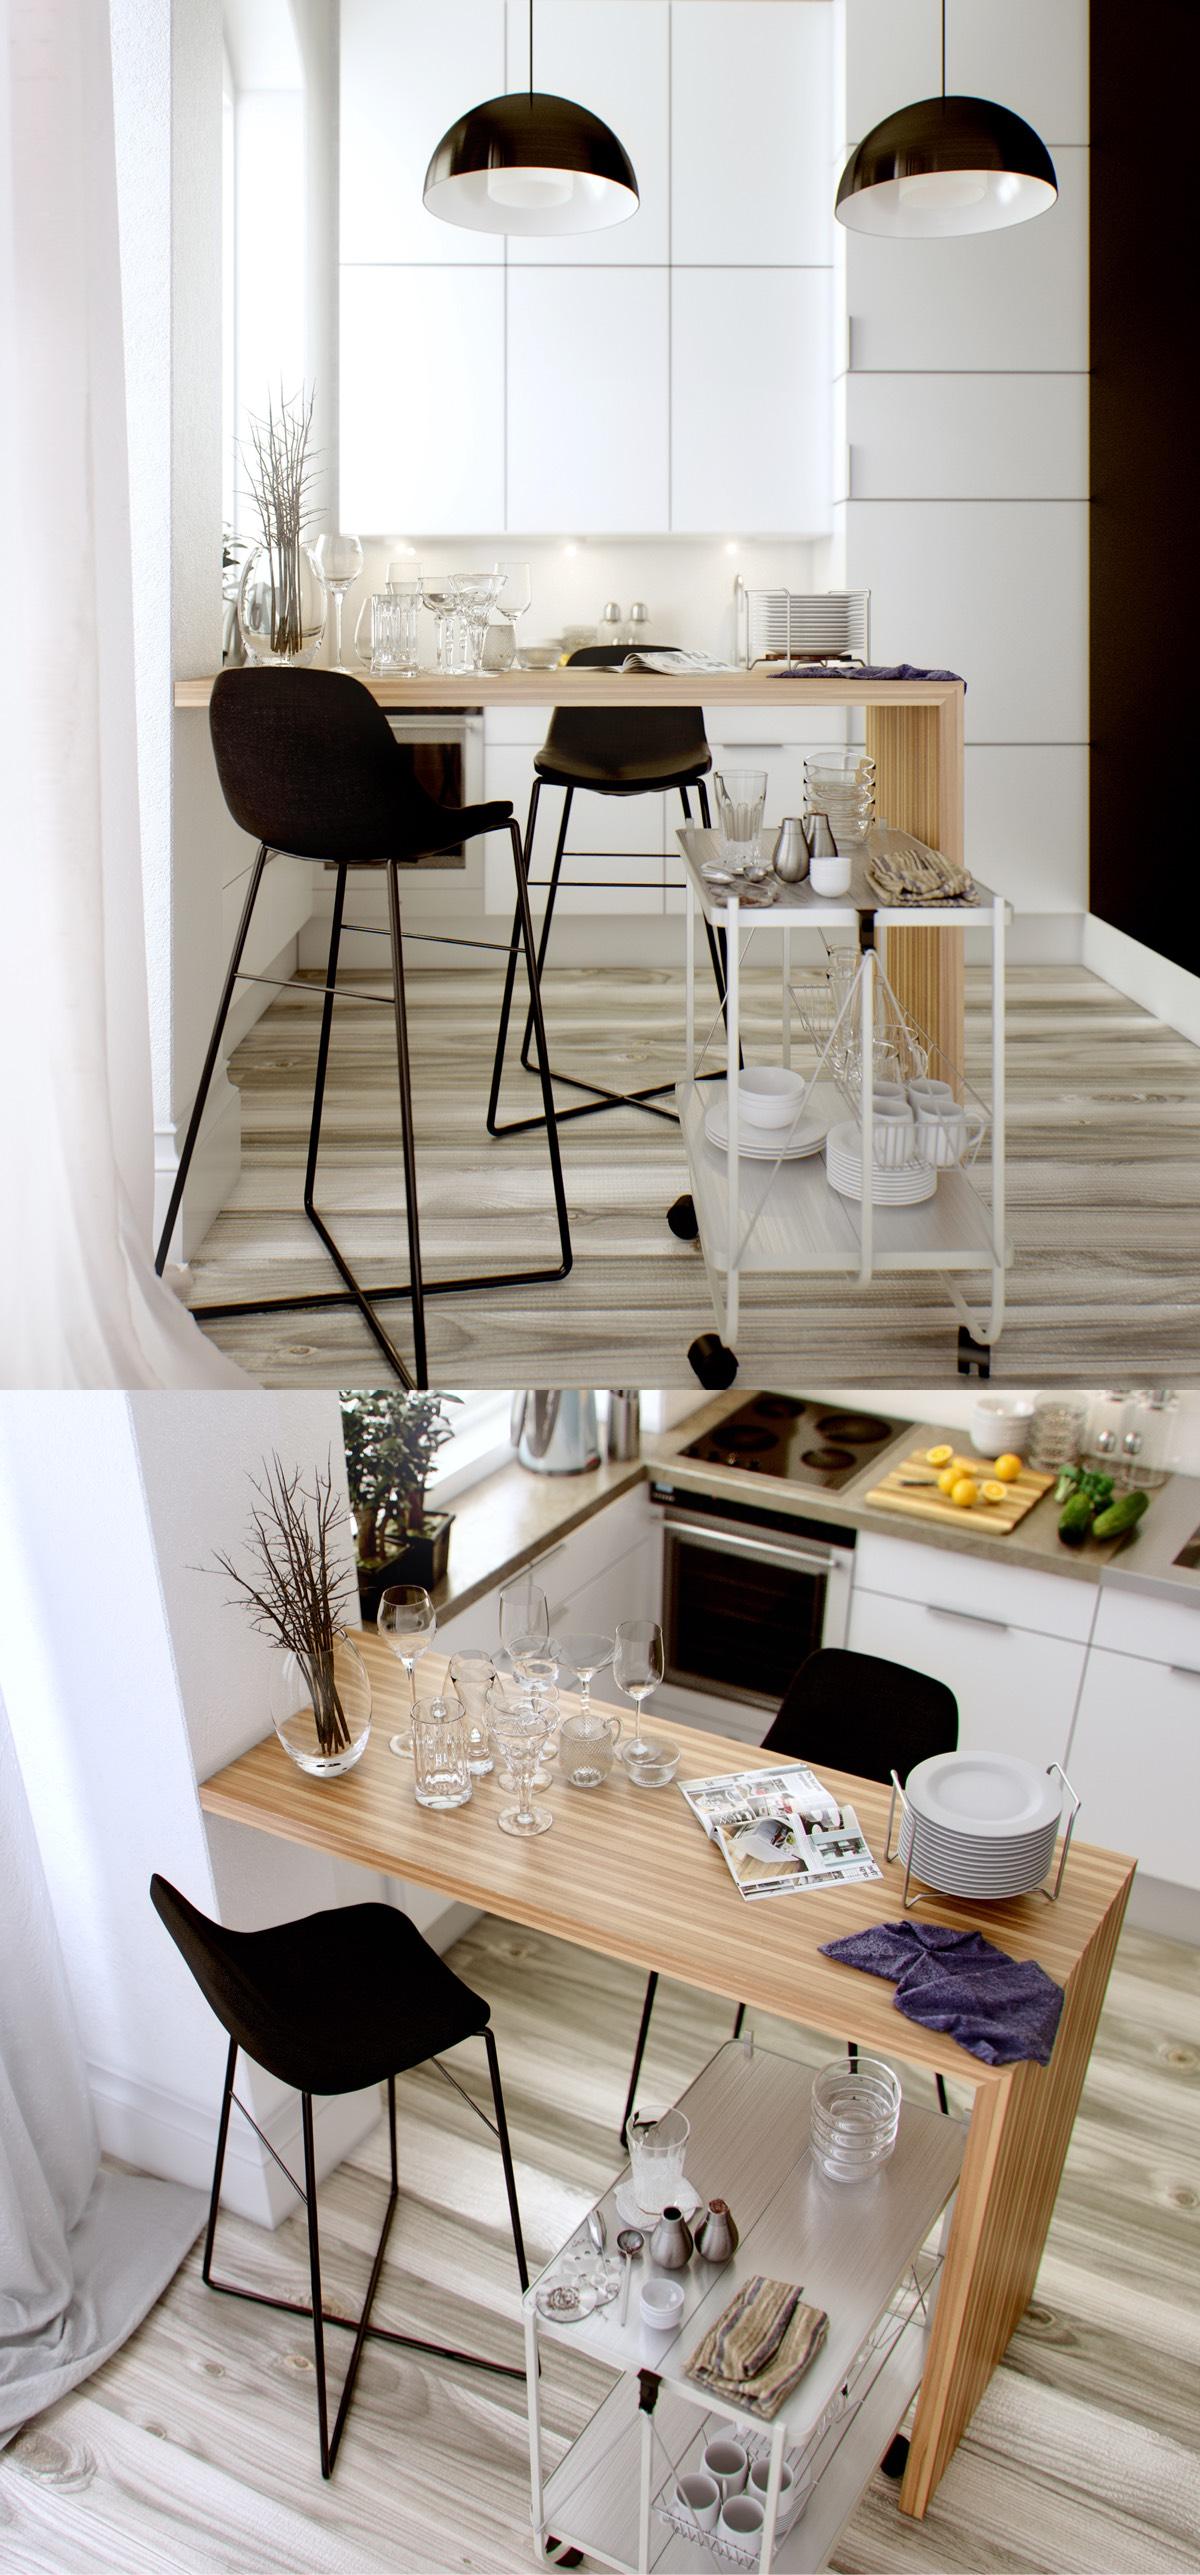 black-and-white small kitchen design